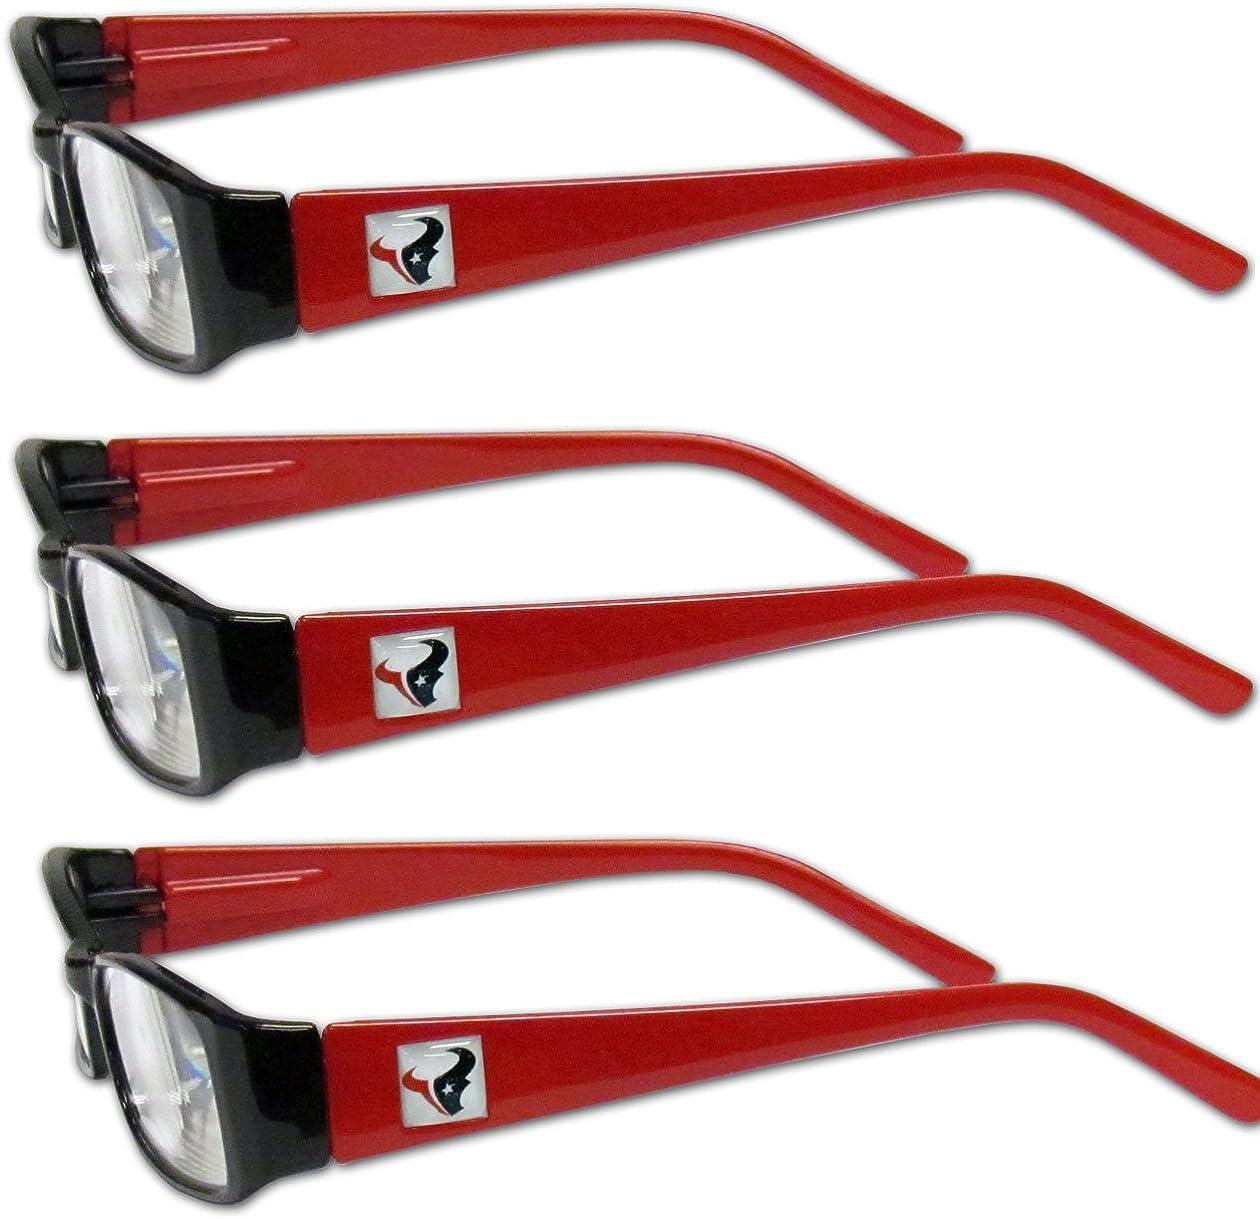 Siskiyou NCAA Fan Shop Sports Reading Glasses 3 Pack